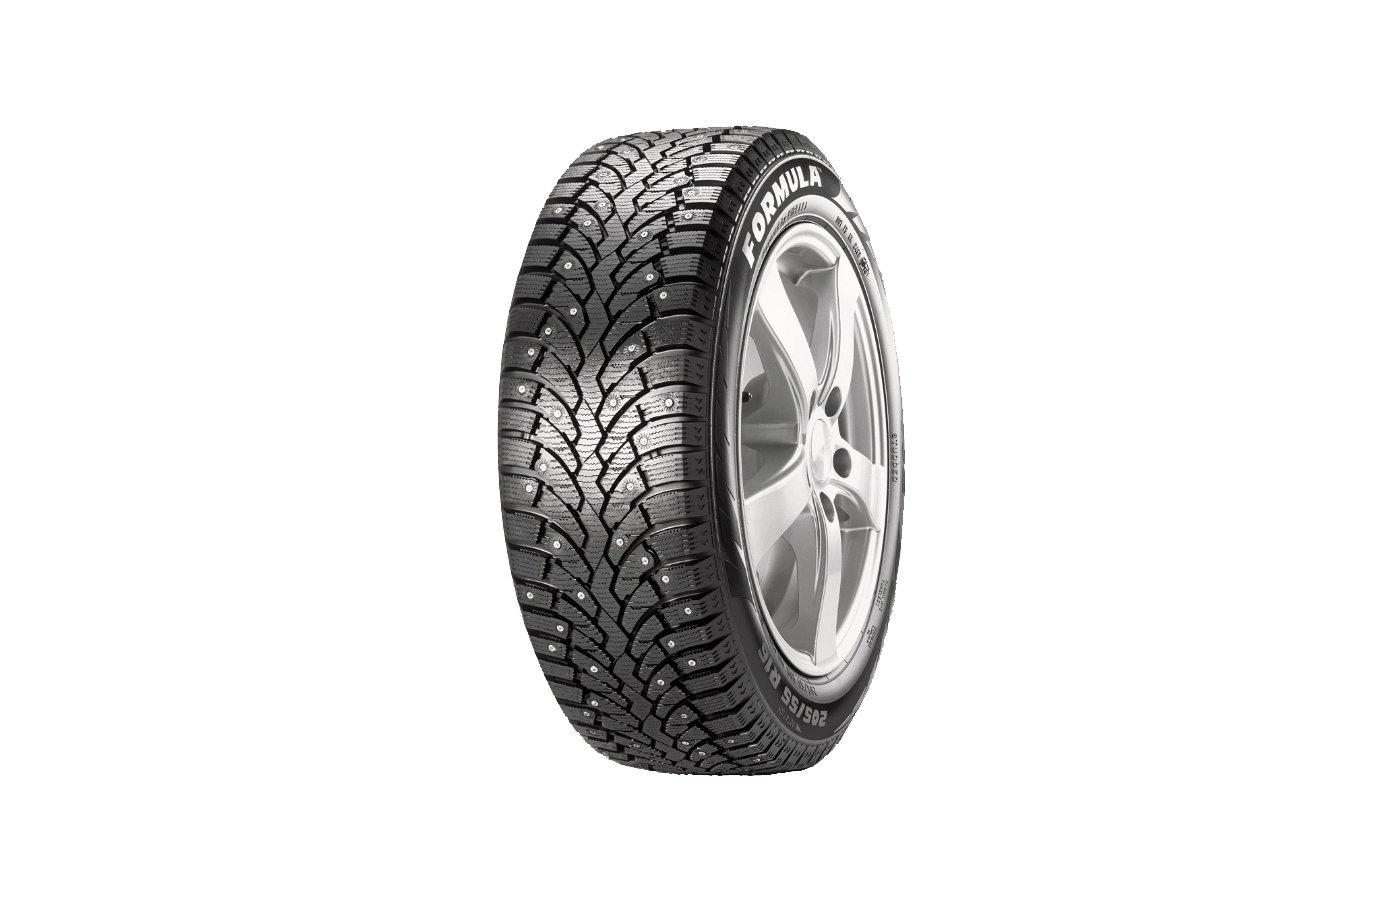 Шина Pirelli Formula Ice 215/70 R16 TL 100T шип